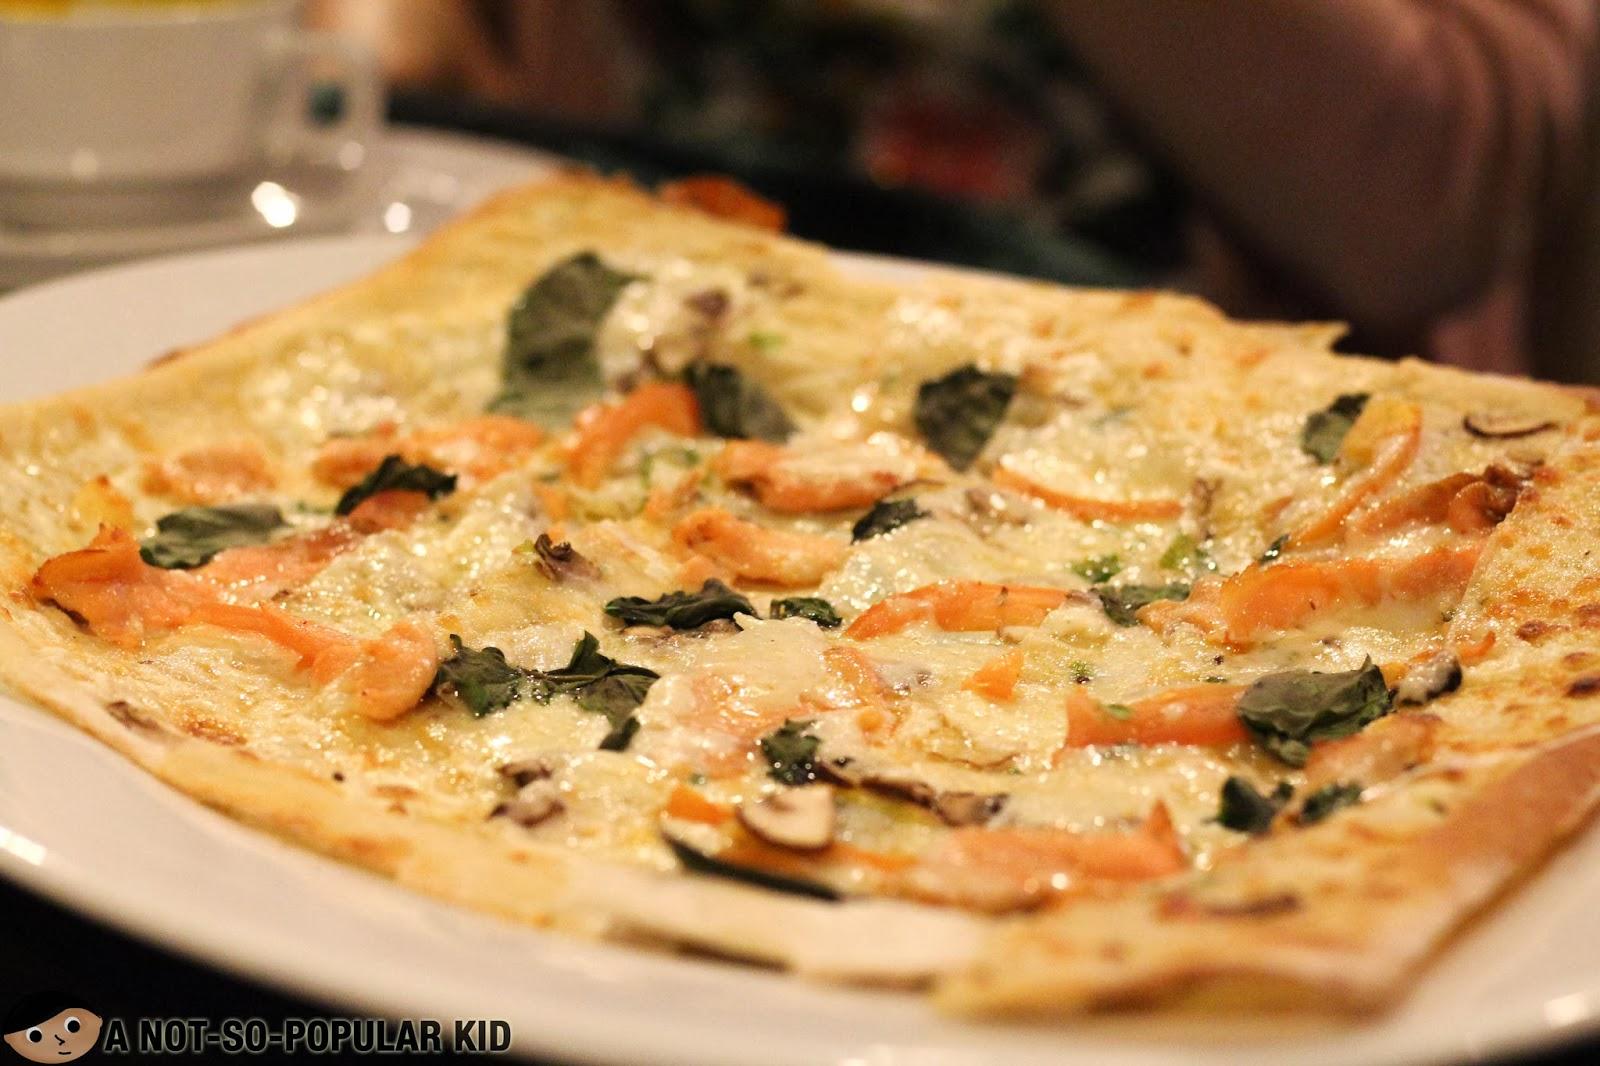 The Original Antonio pizza of My Kitchen - smoked salmon!